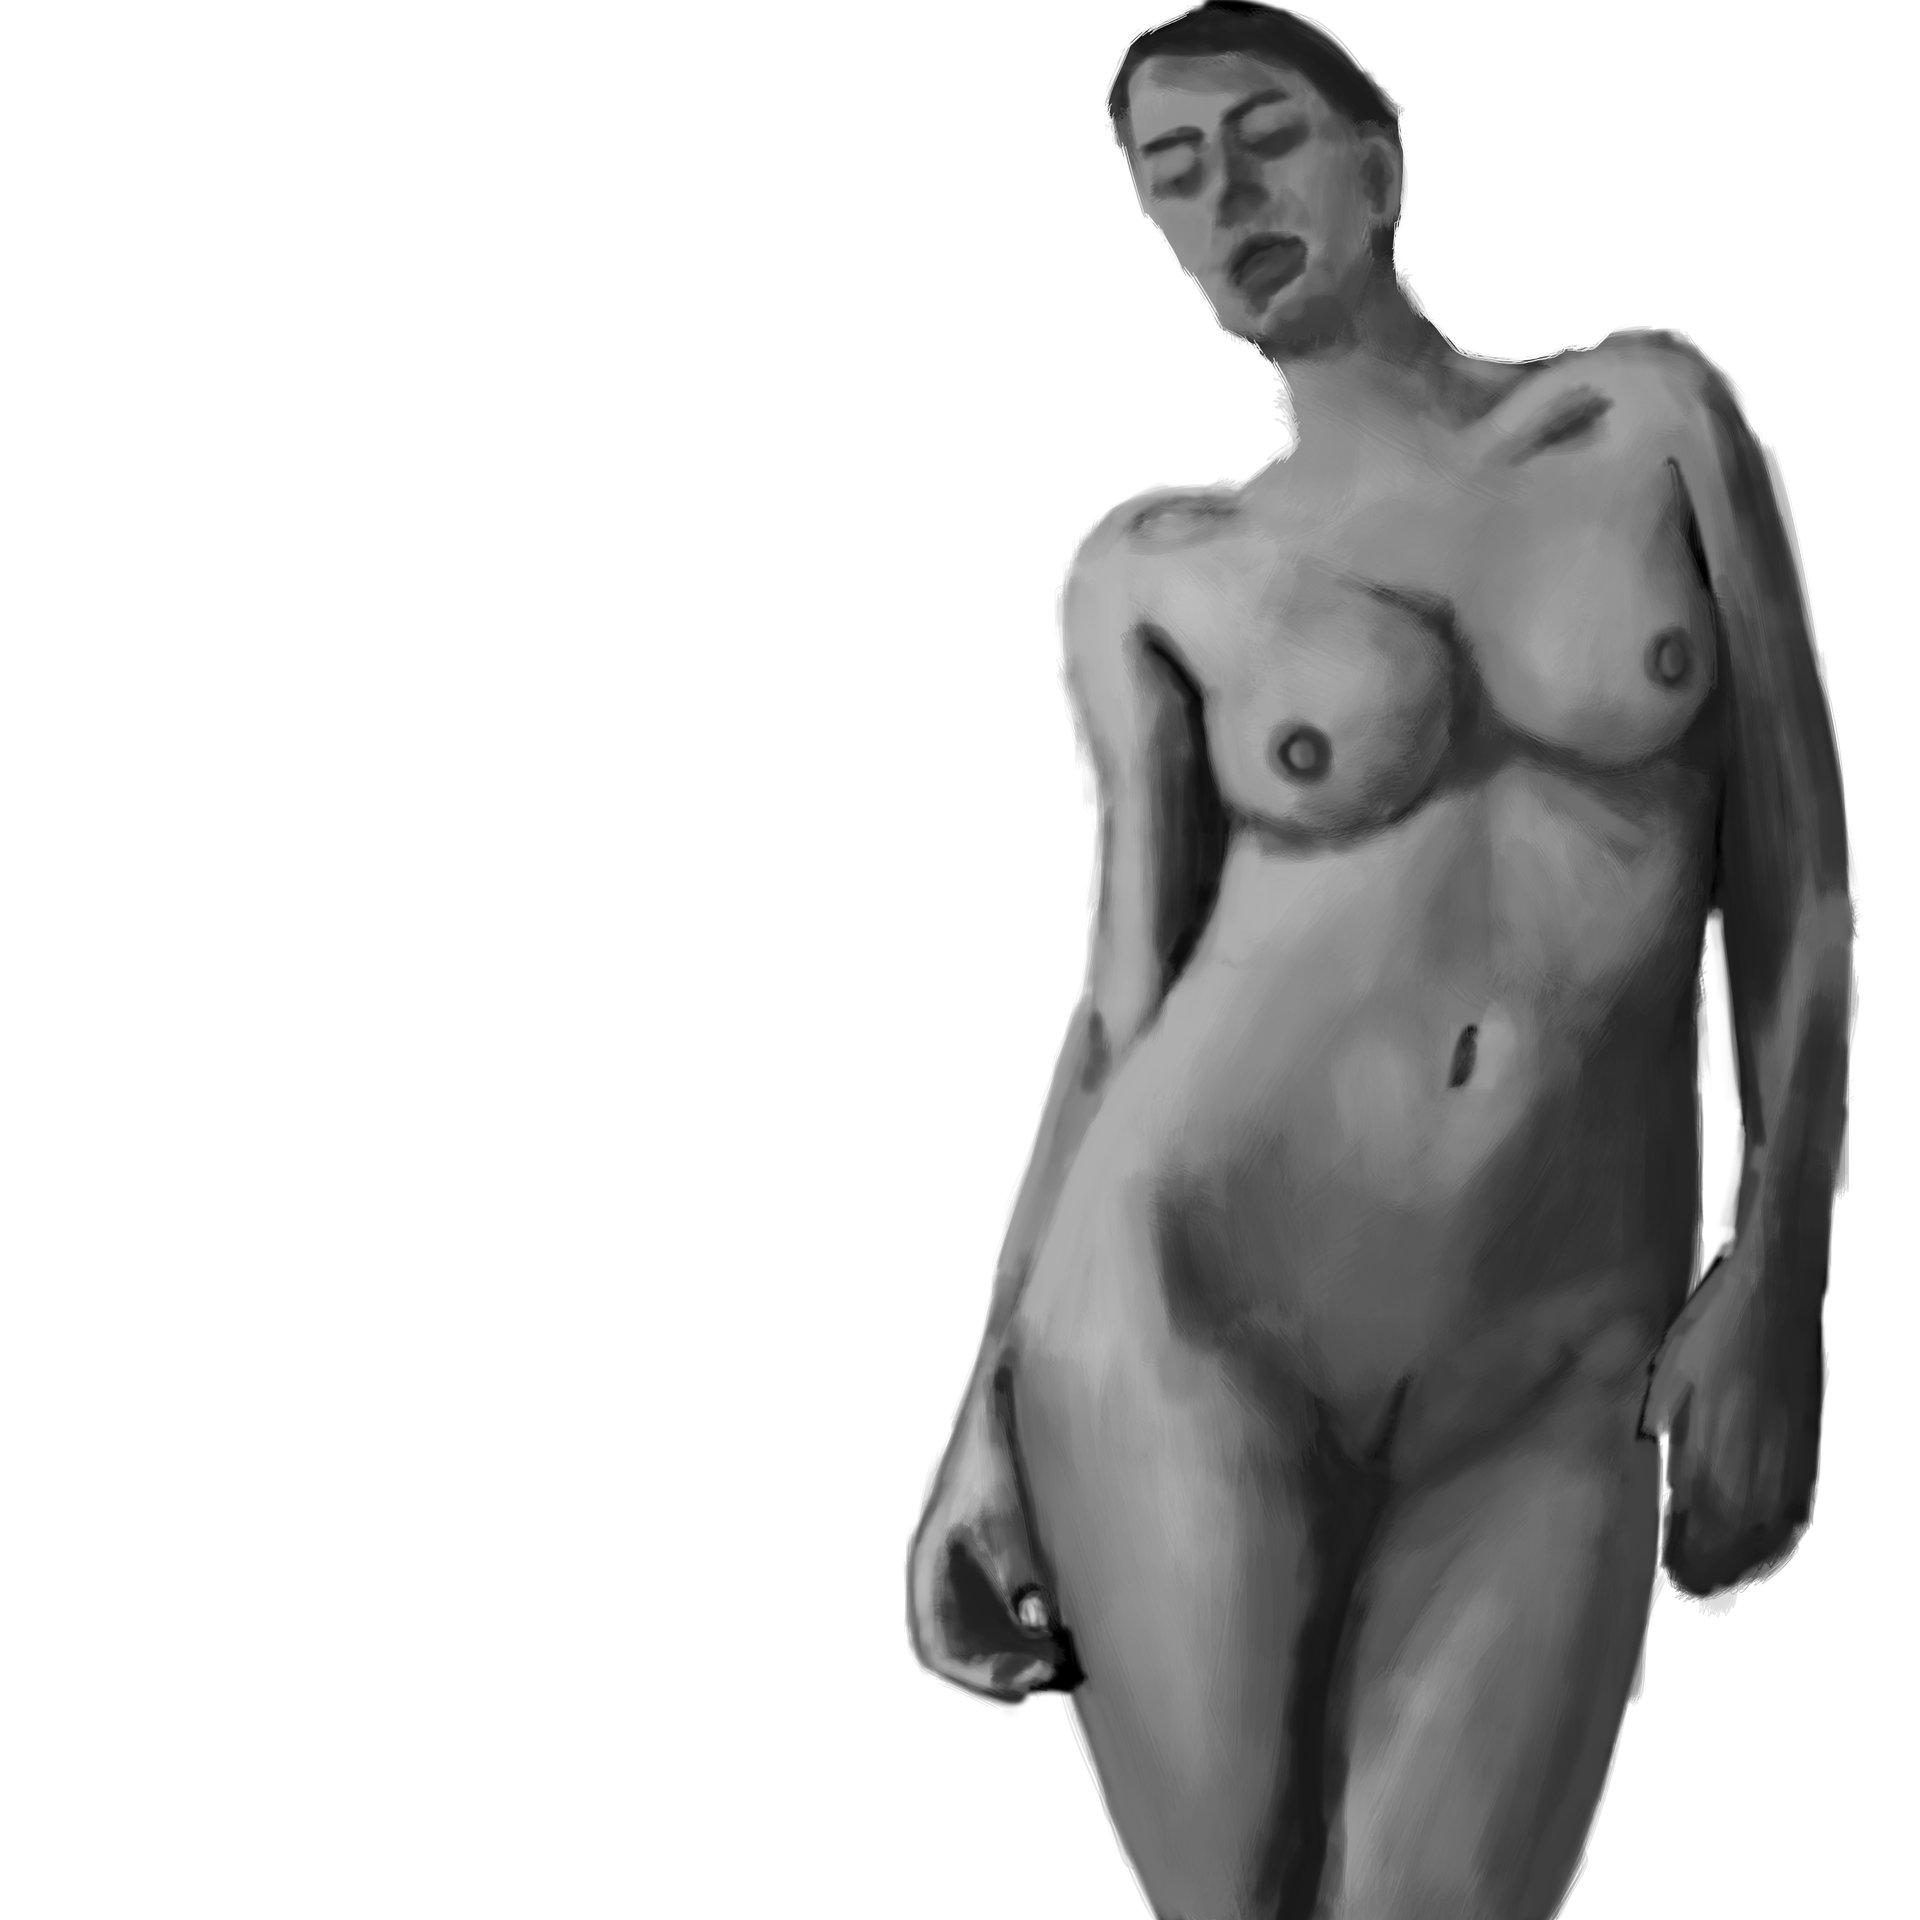 Palo piktor anatomy study